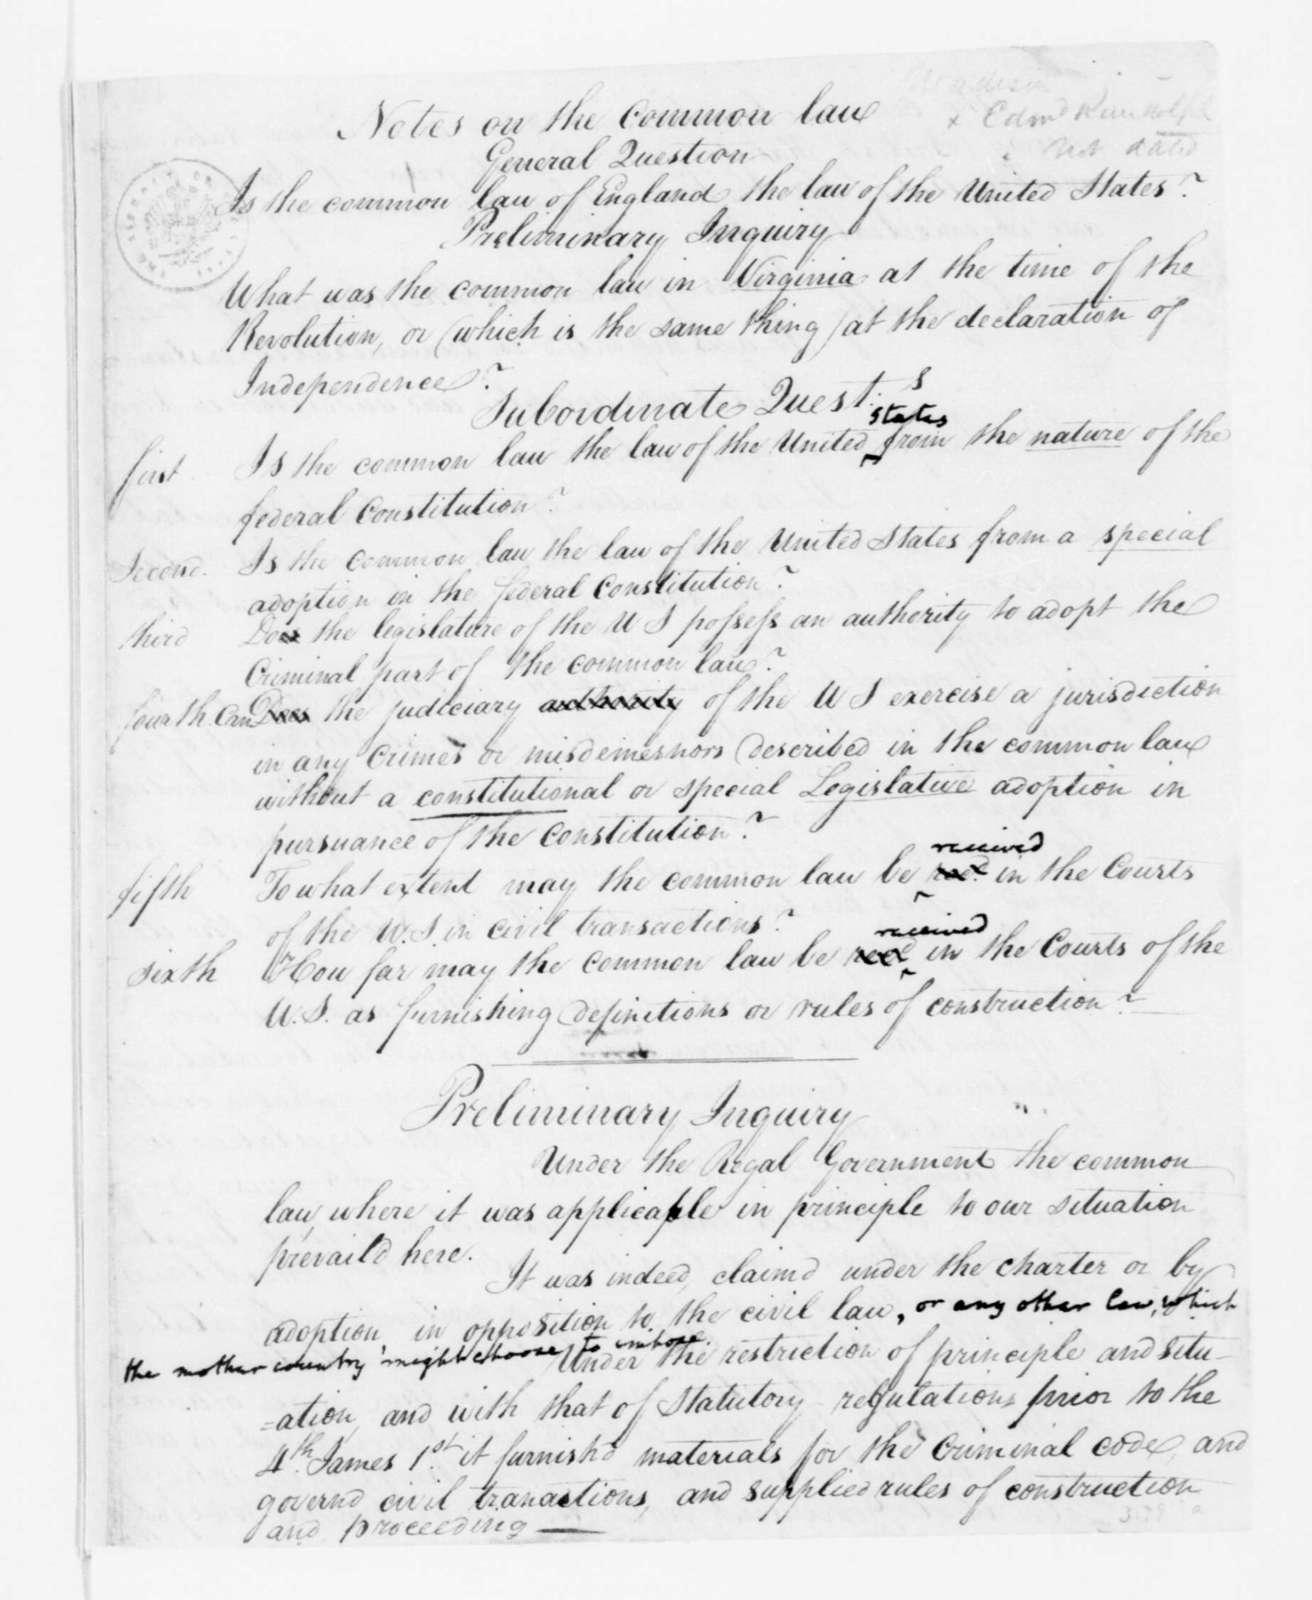 Edmund Pendleton. Notes, Common Law. 1790.